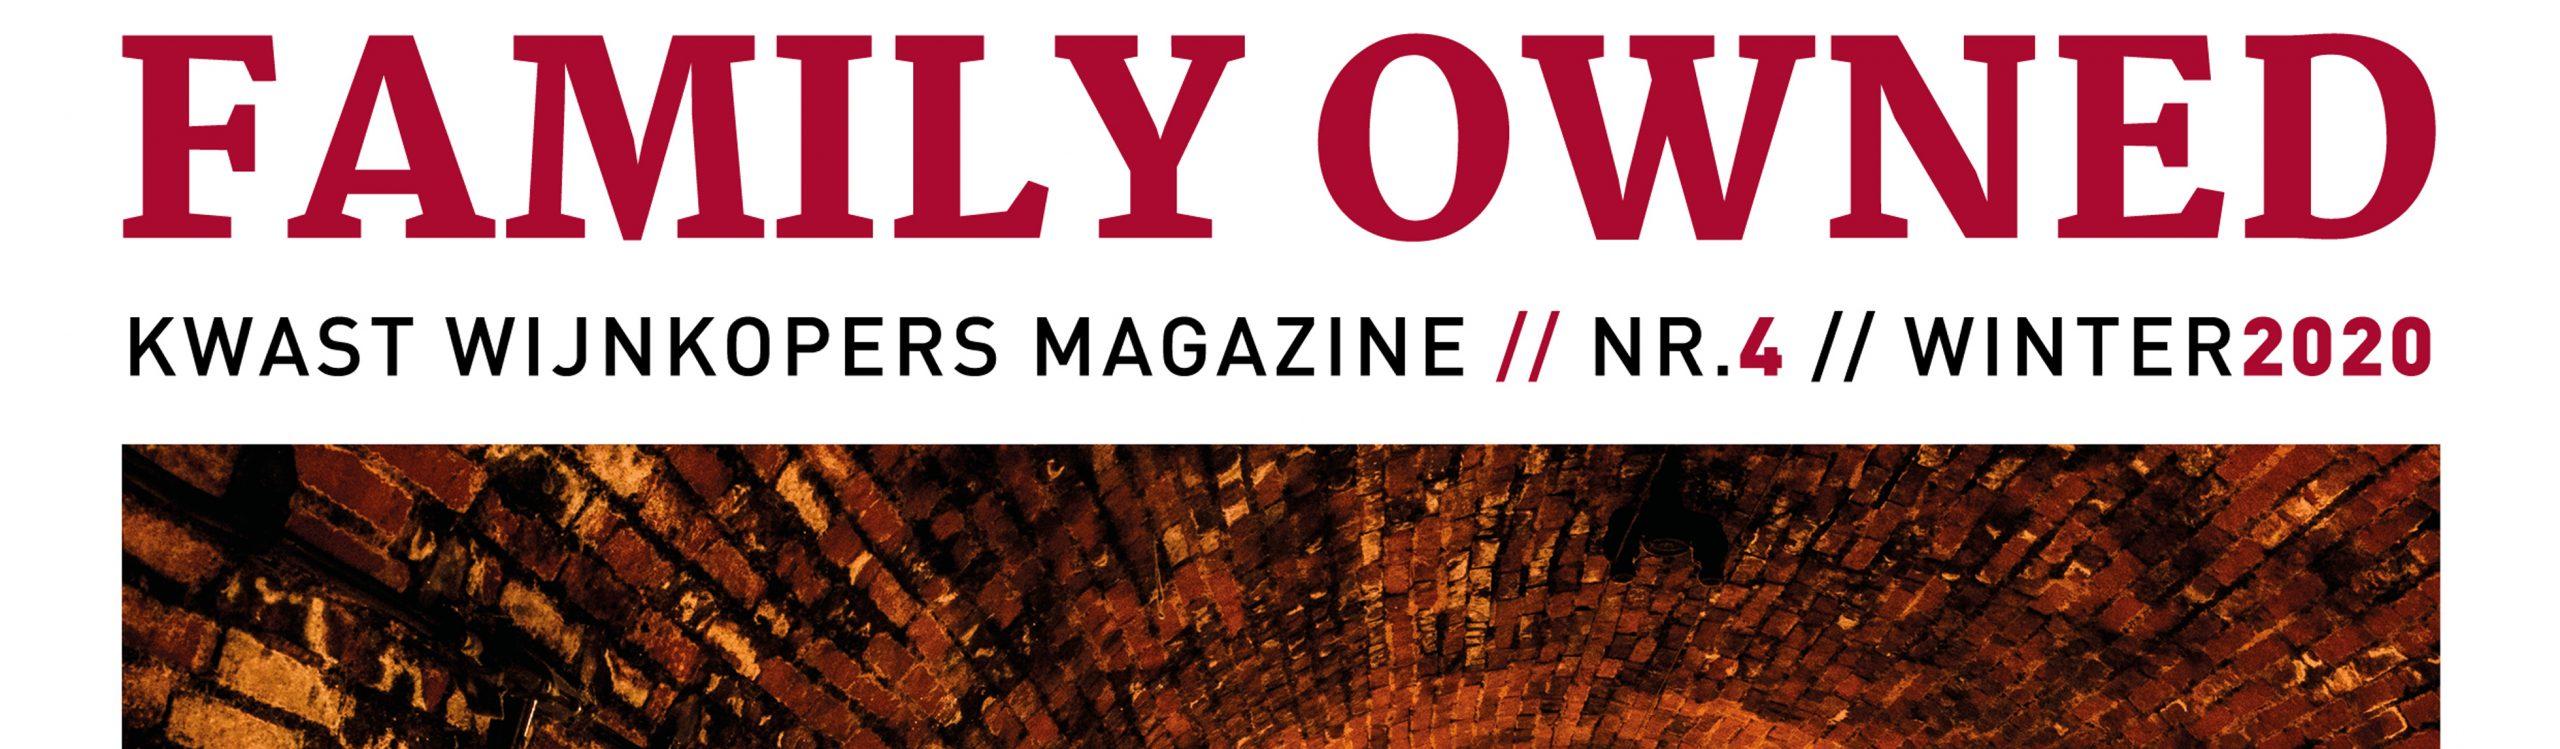 Family Owned Magazine #4